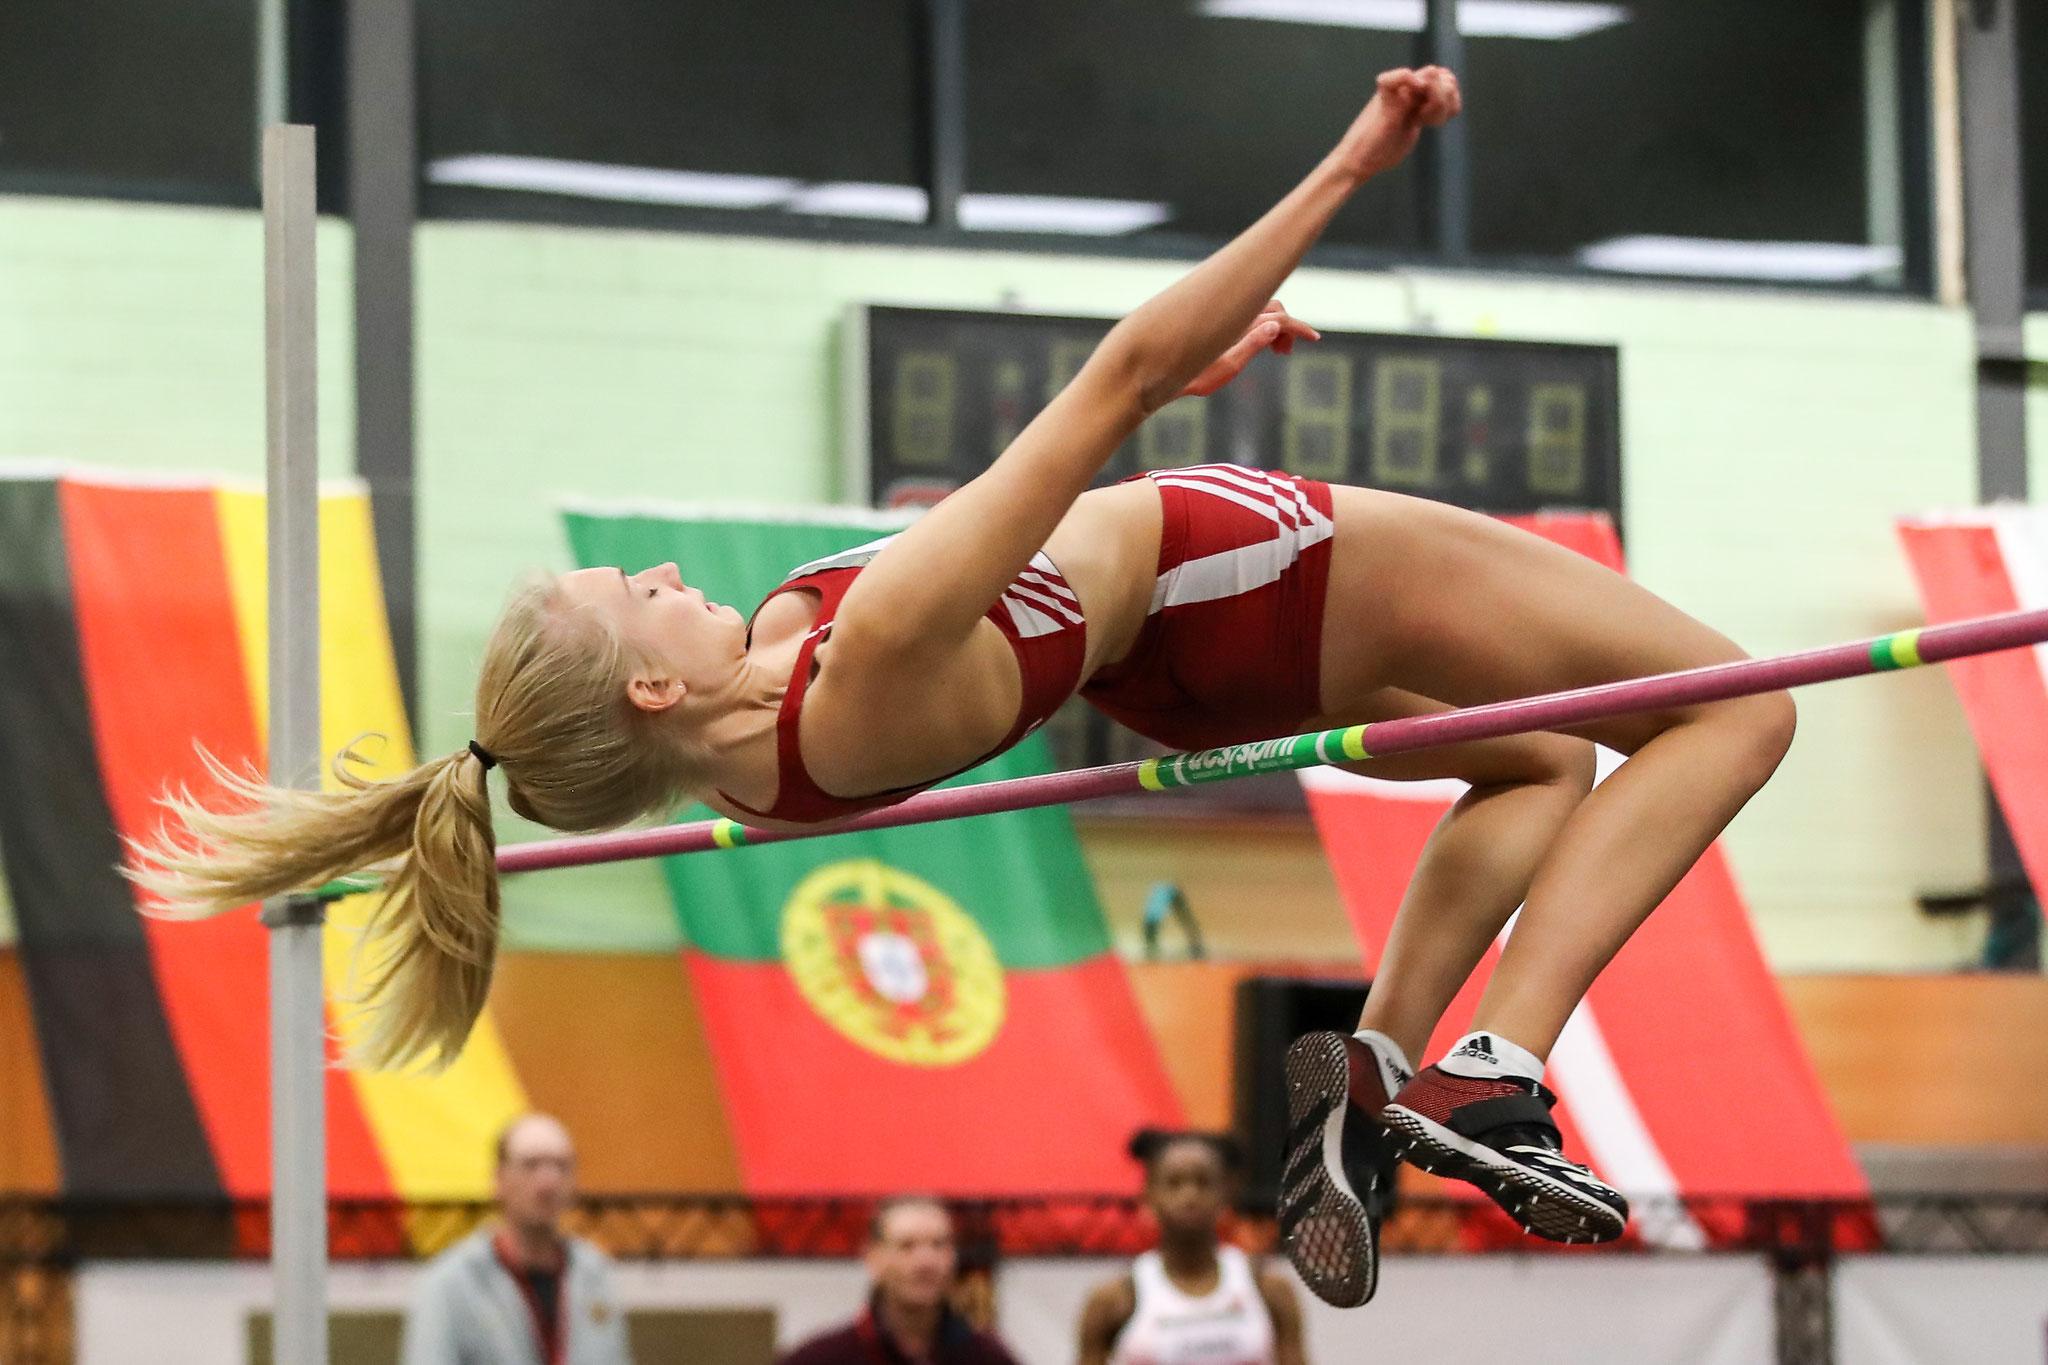 Bianca Stichling (Foto: Footcorner/Dirk Fußwinkel)